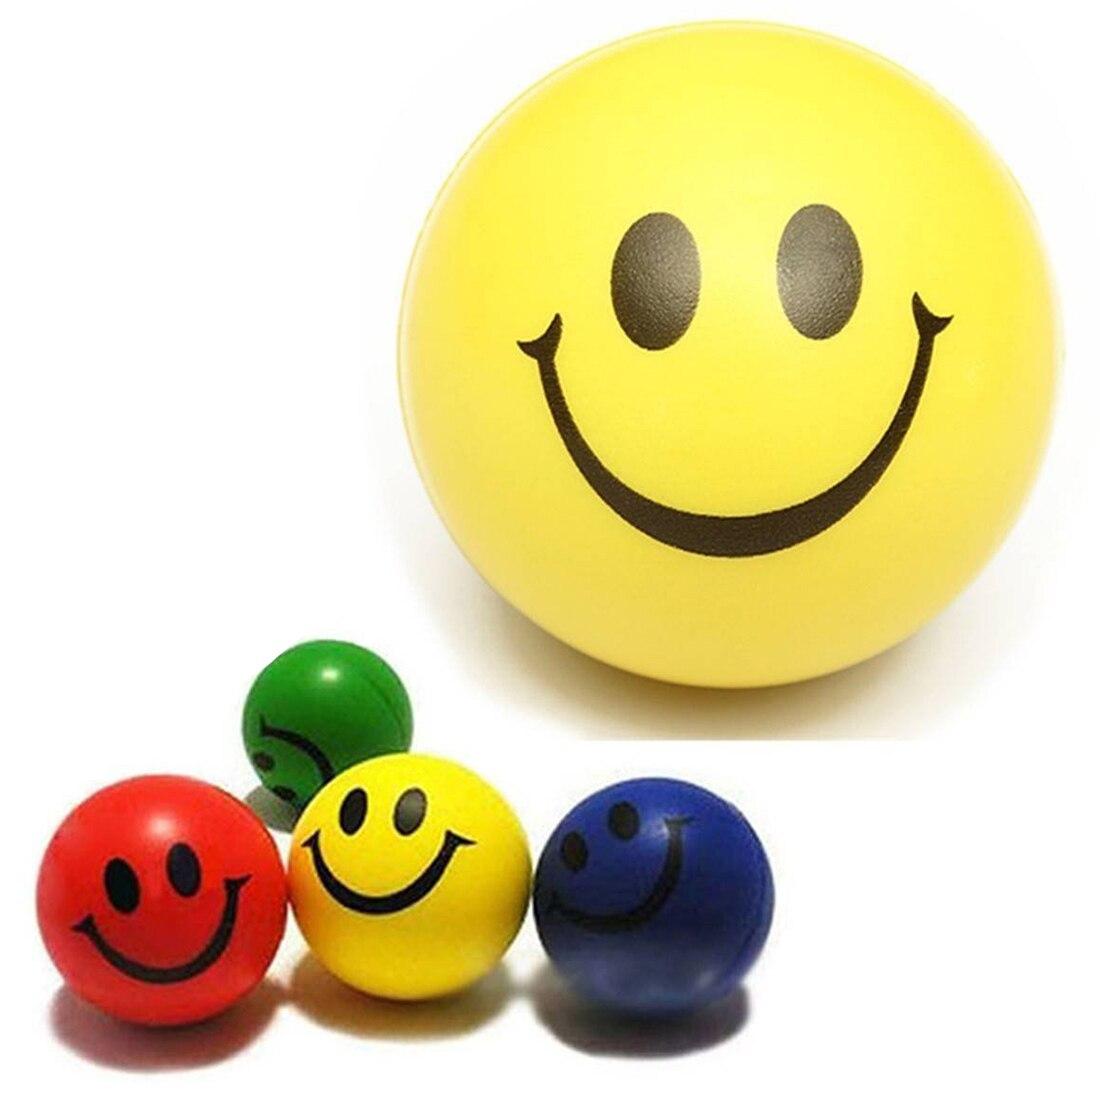 2x bola inflable Anti-estrés bola relajante dedo Trainer cara sonriente alivio Squeeze ball feliz Lámpara colgante de bola de cristal nórdico para comedor, restaurante, dormitorio, decoración del hogar, iluminación de cocina